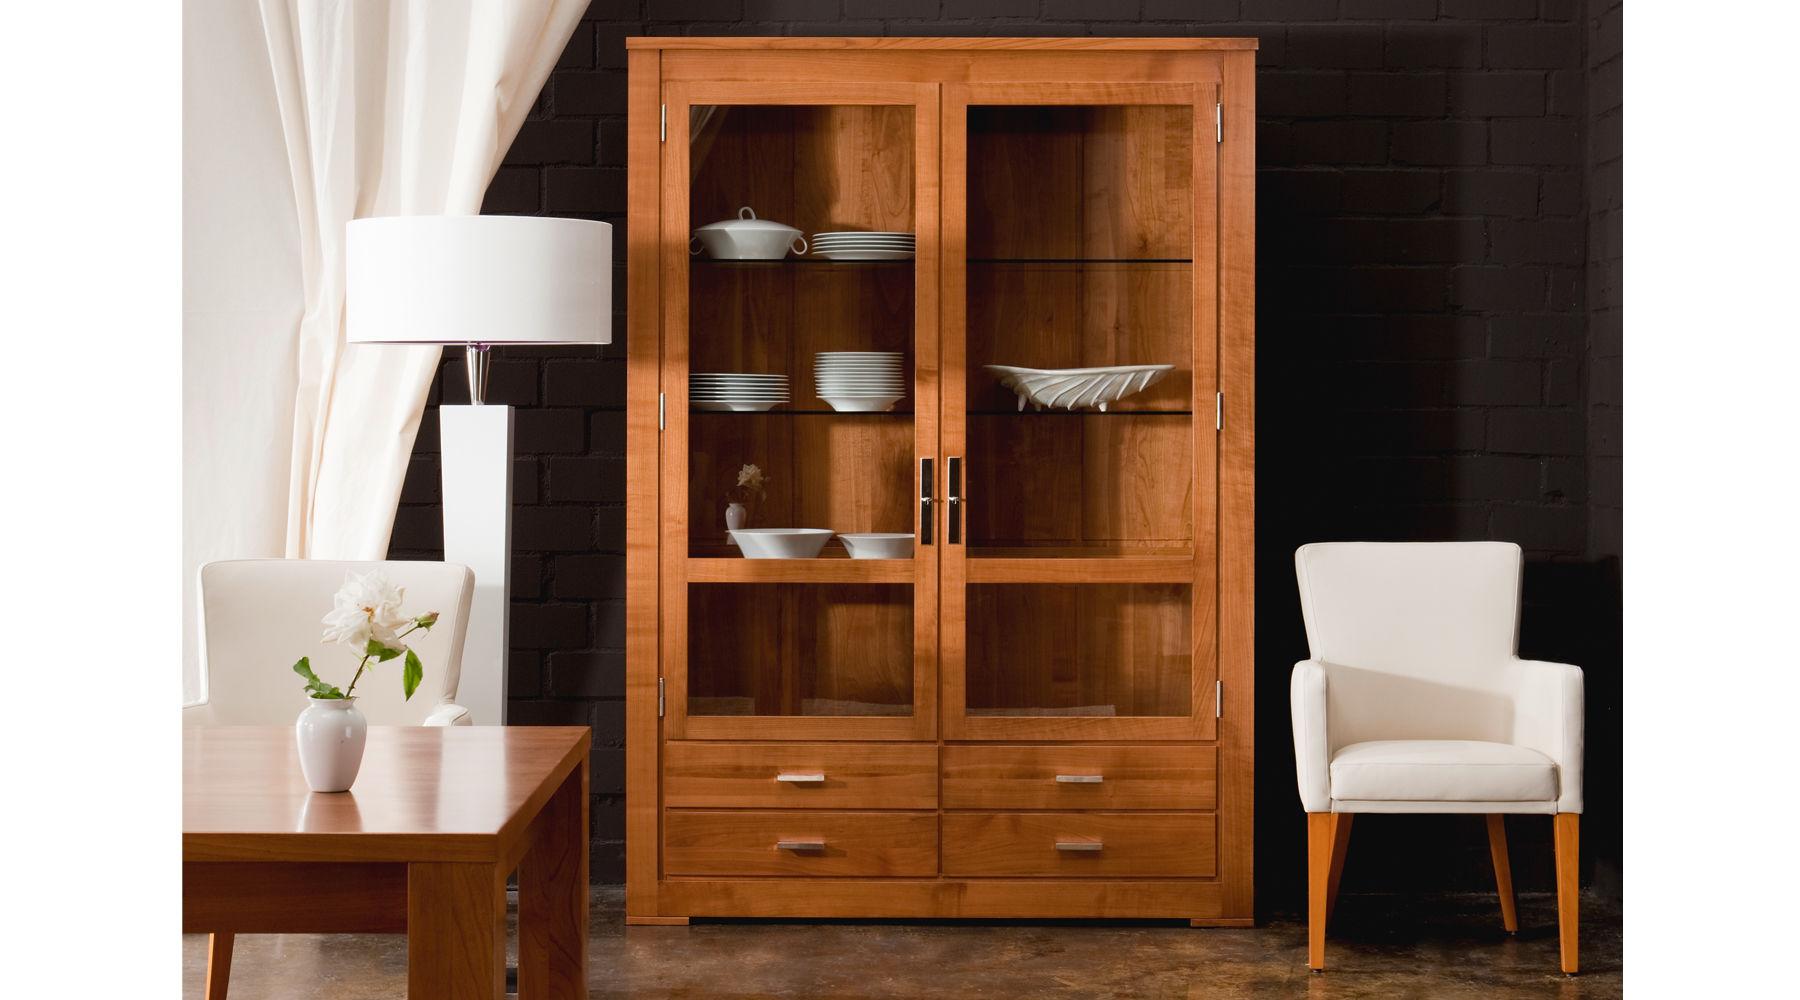 wohnzimmerschr nke m bel hesse. Black Bedroom Furniture Sets. Home Design Ideas